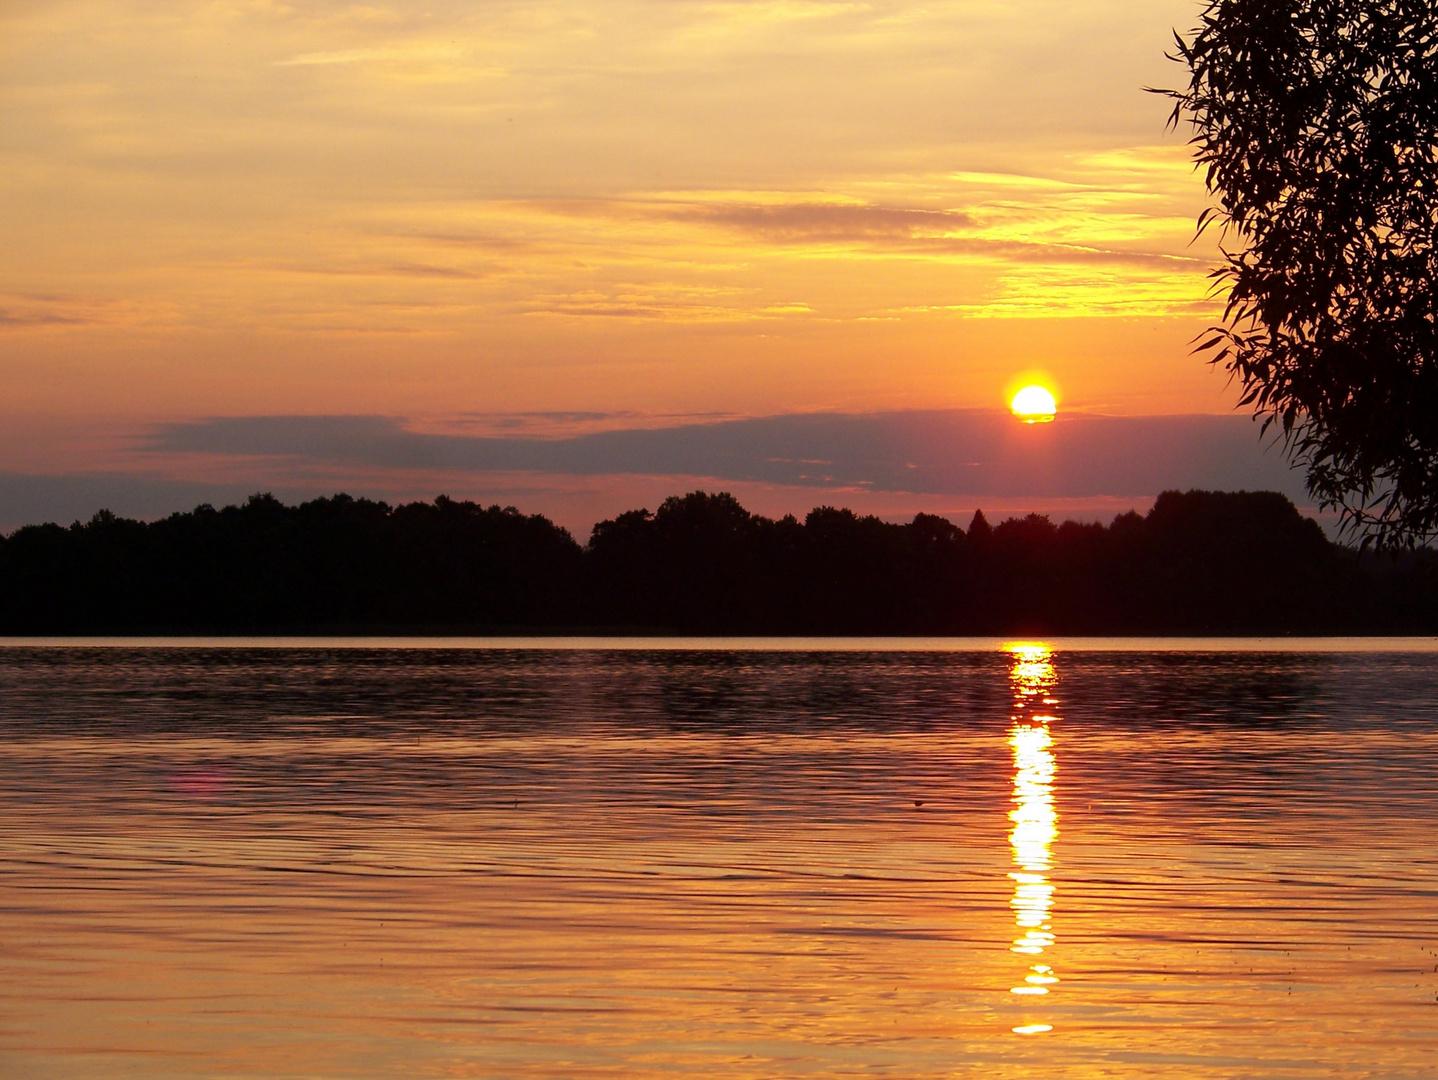 Sonnenuntergang über dem See Narie